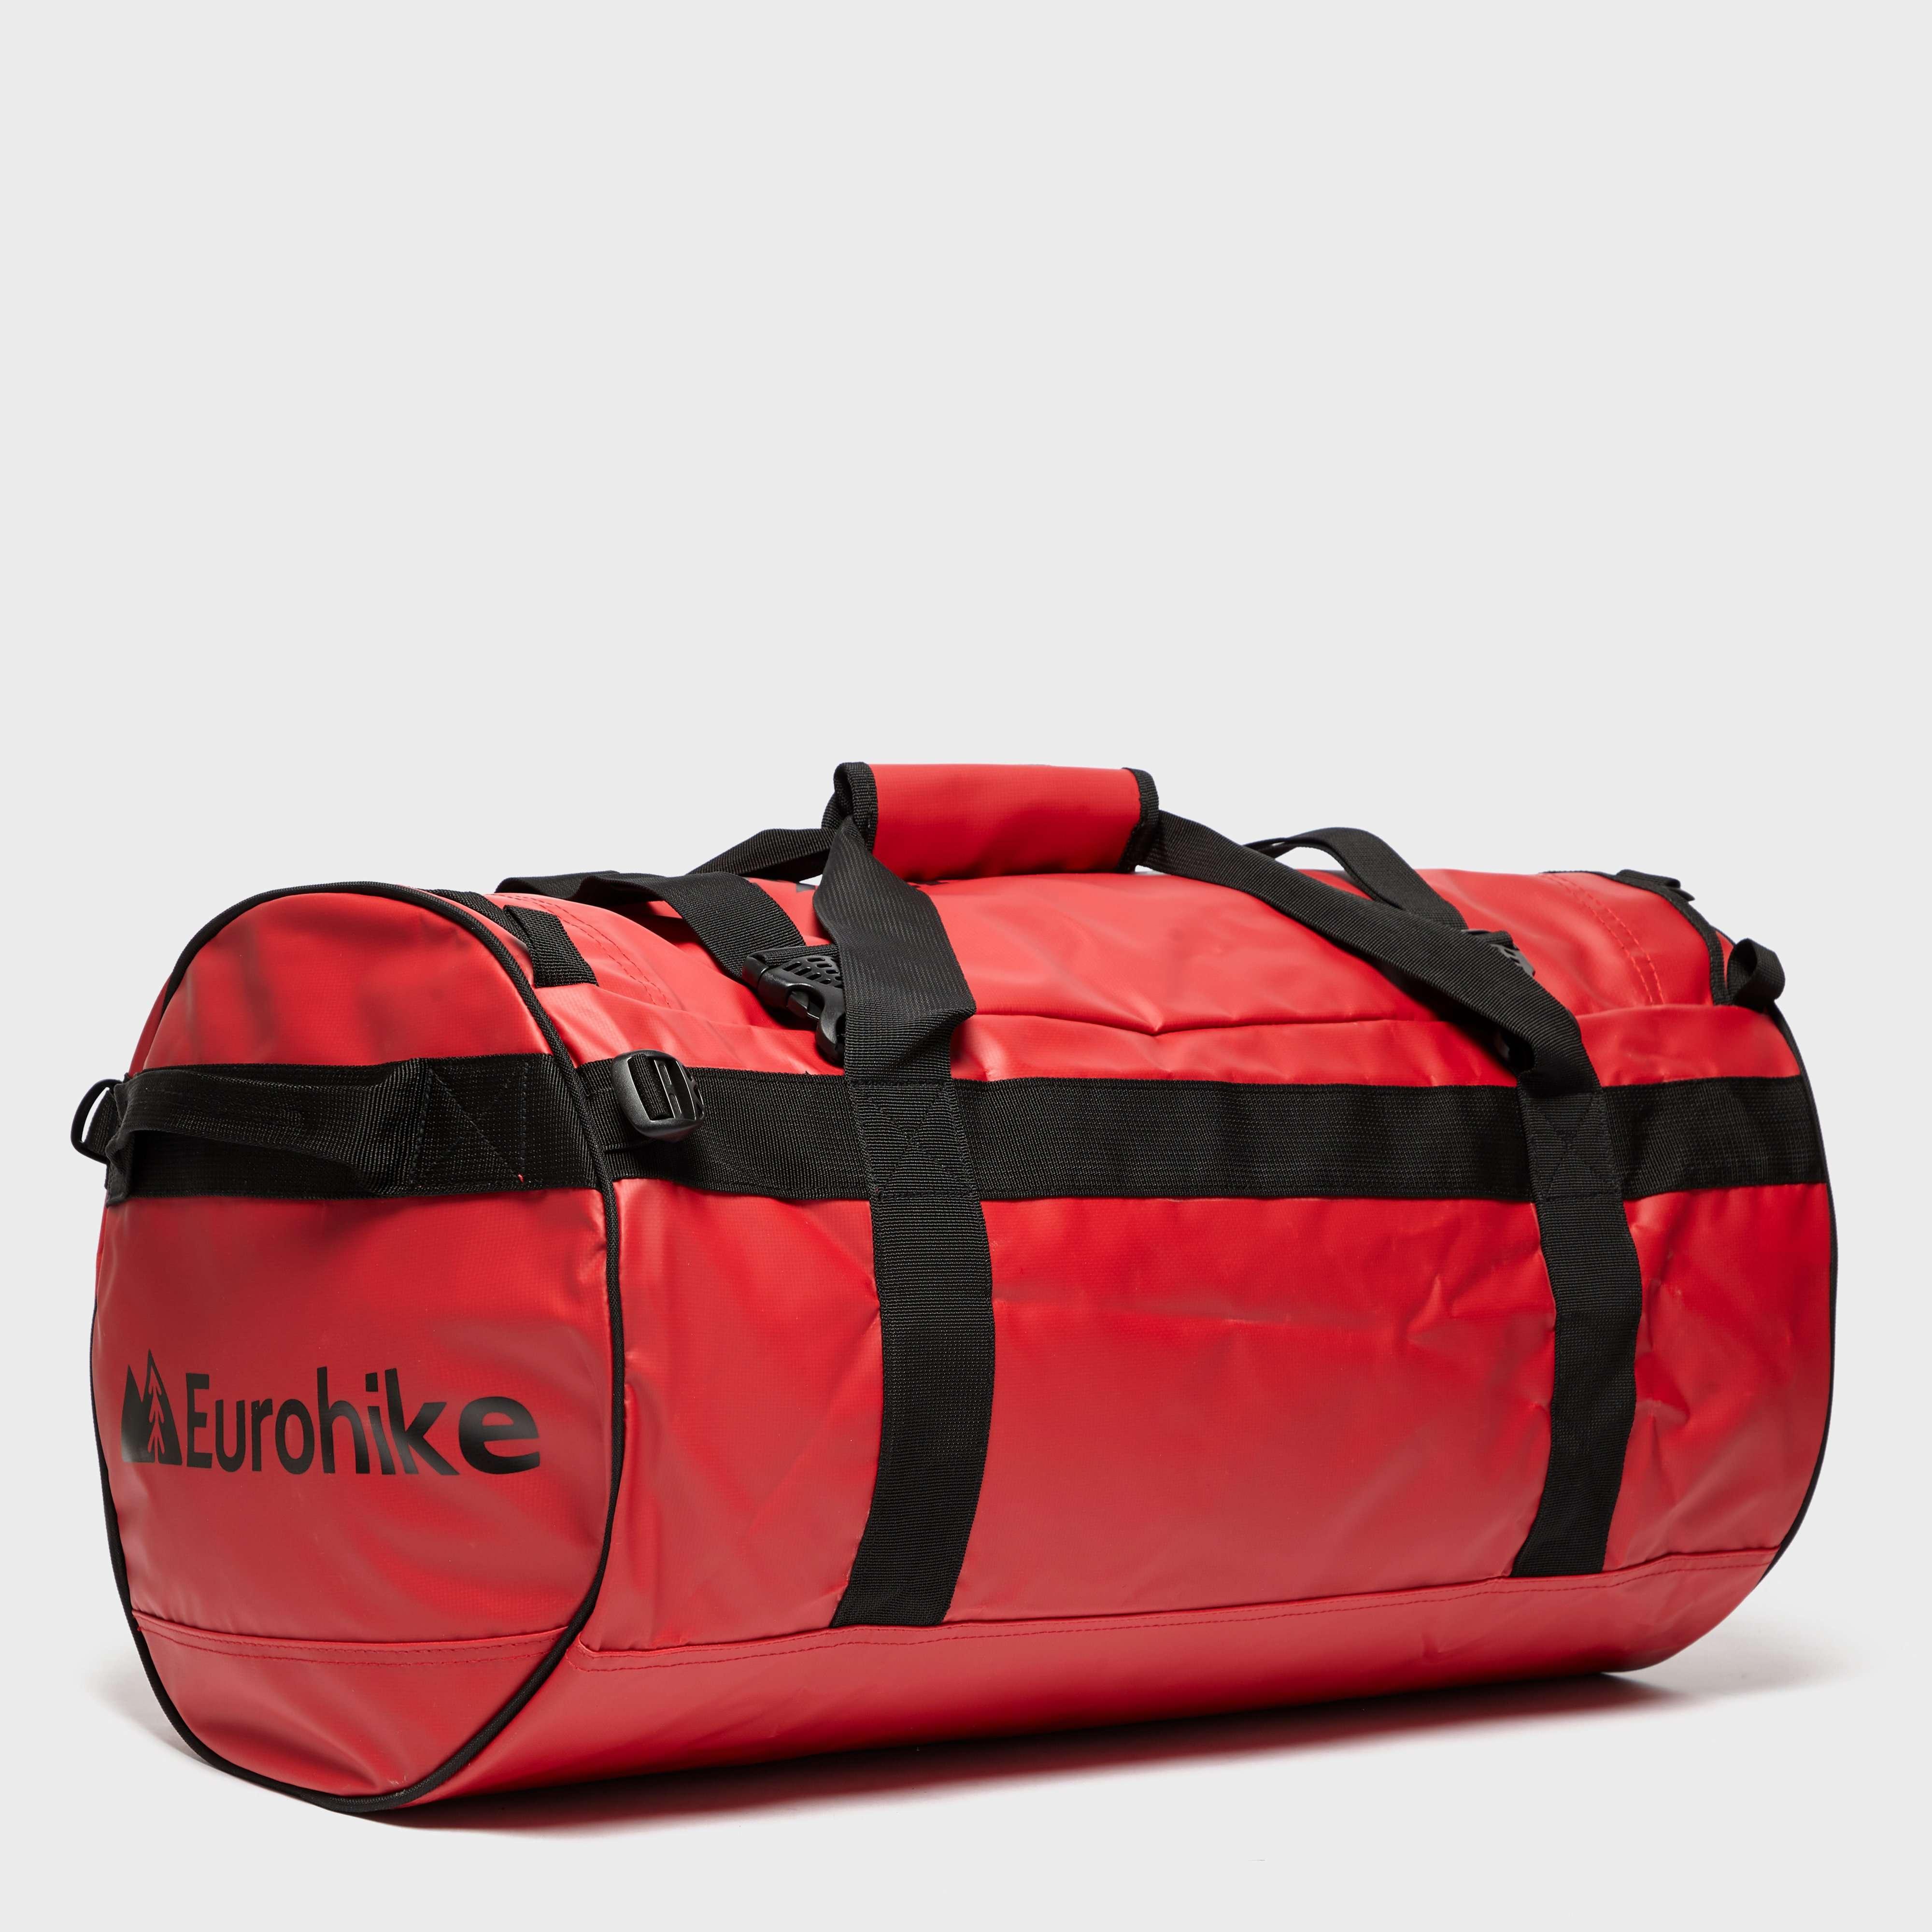 EUROHIKE Transit 65 Litre Duffel Bag